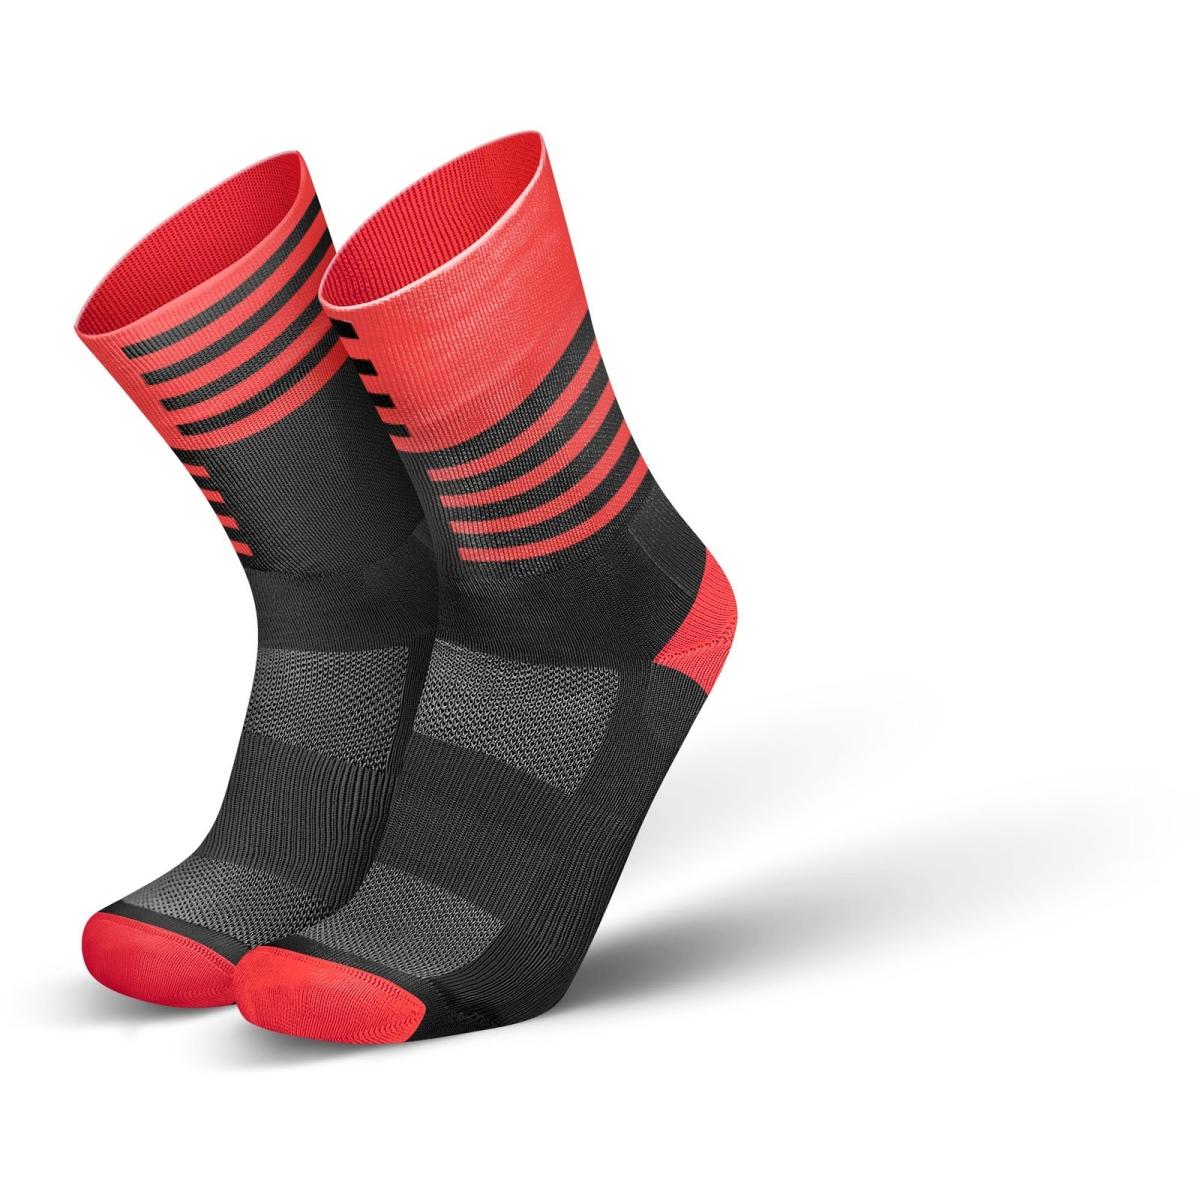 Produktbild von INCYLENCE Ultralight Wings Socken - Black Inferno